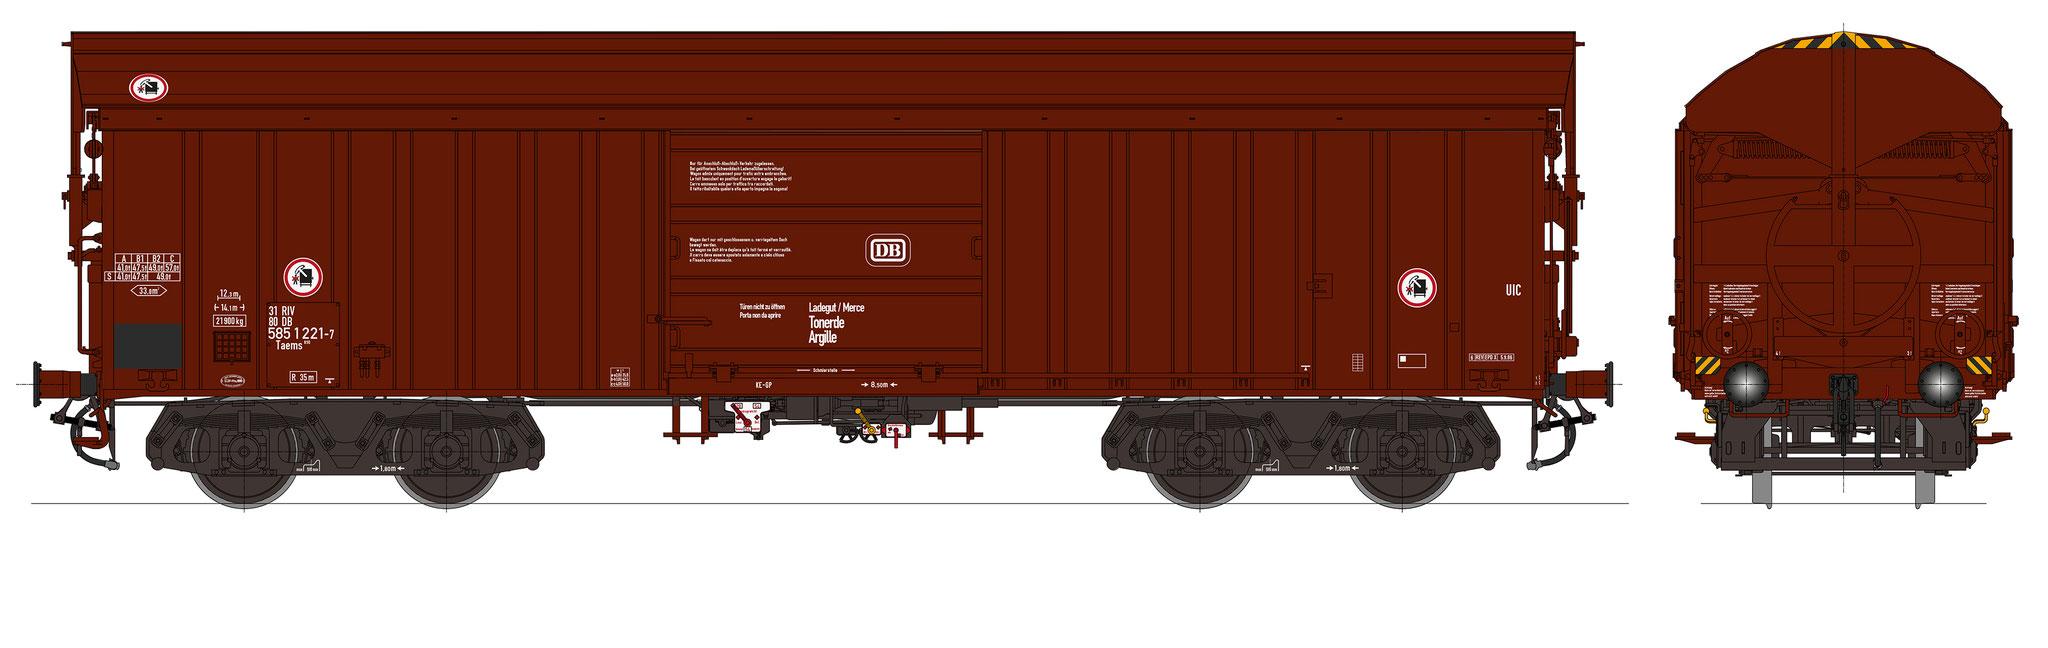 Bestell-Nr. 16067, Ep. 4c, Fahrgestell graubraun